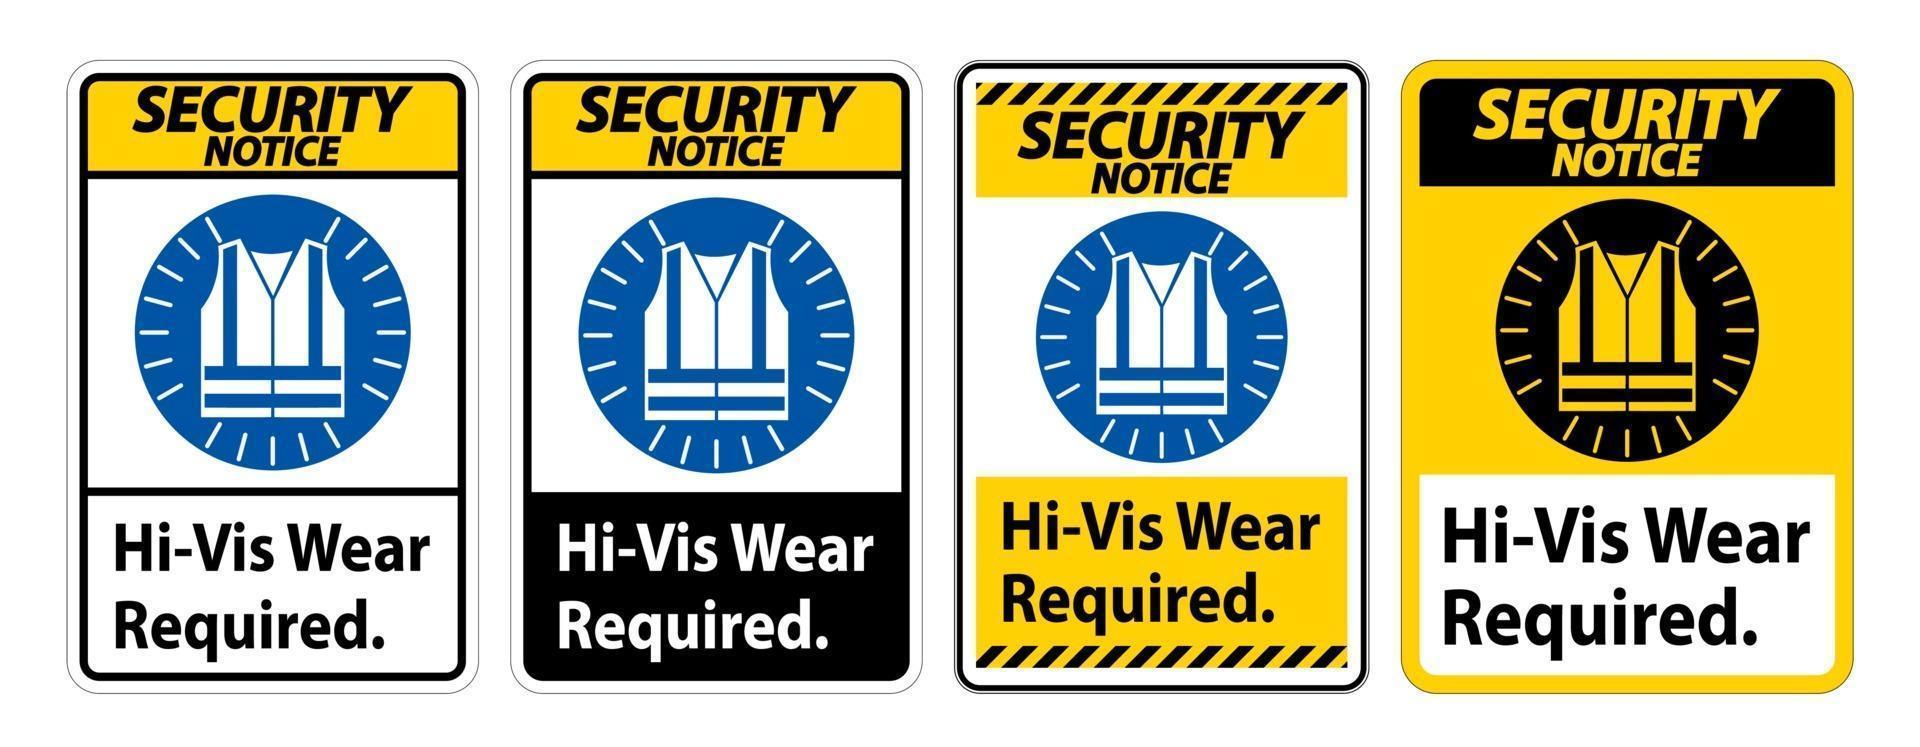 Security Notice Sign Hi-Vis Wear Required set vector